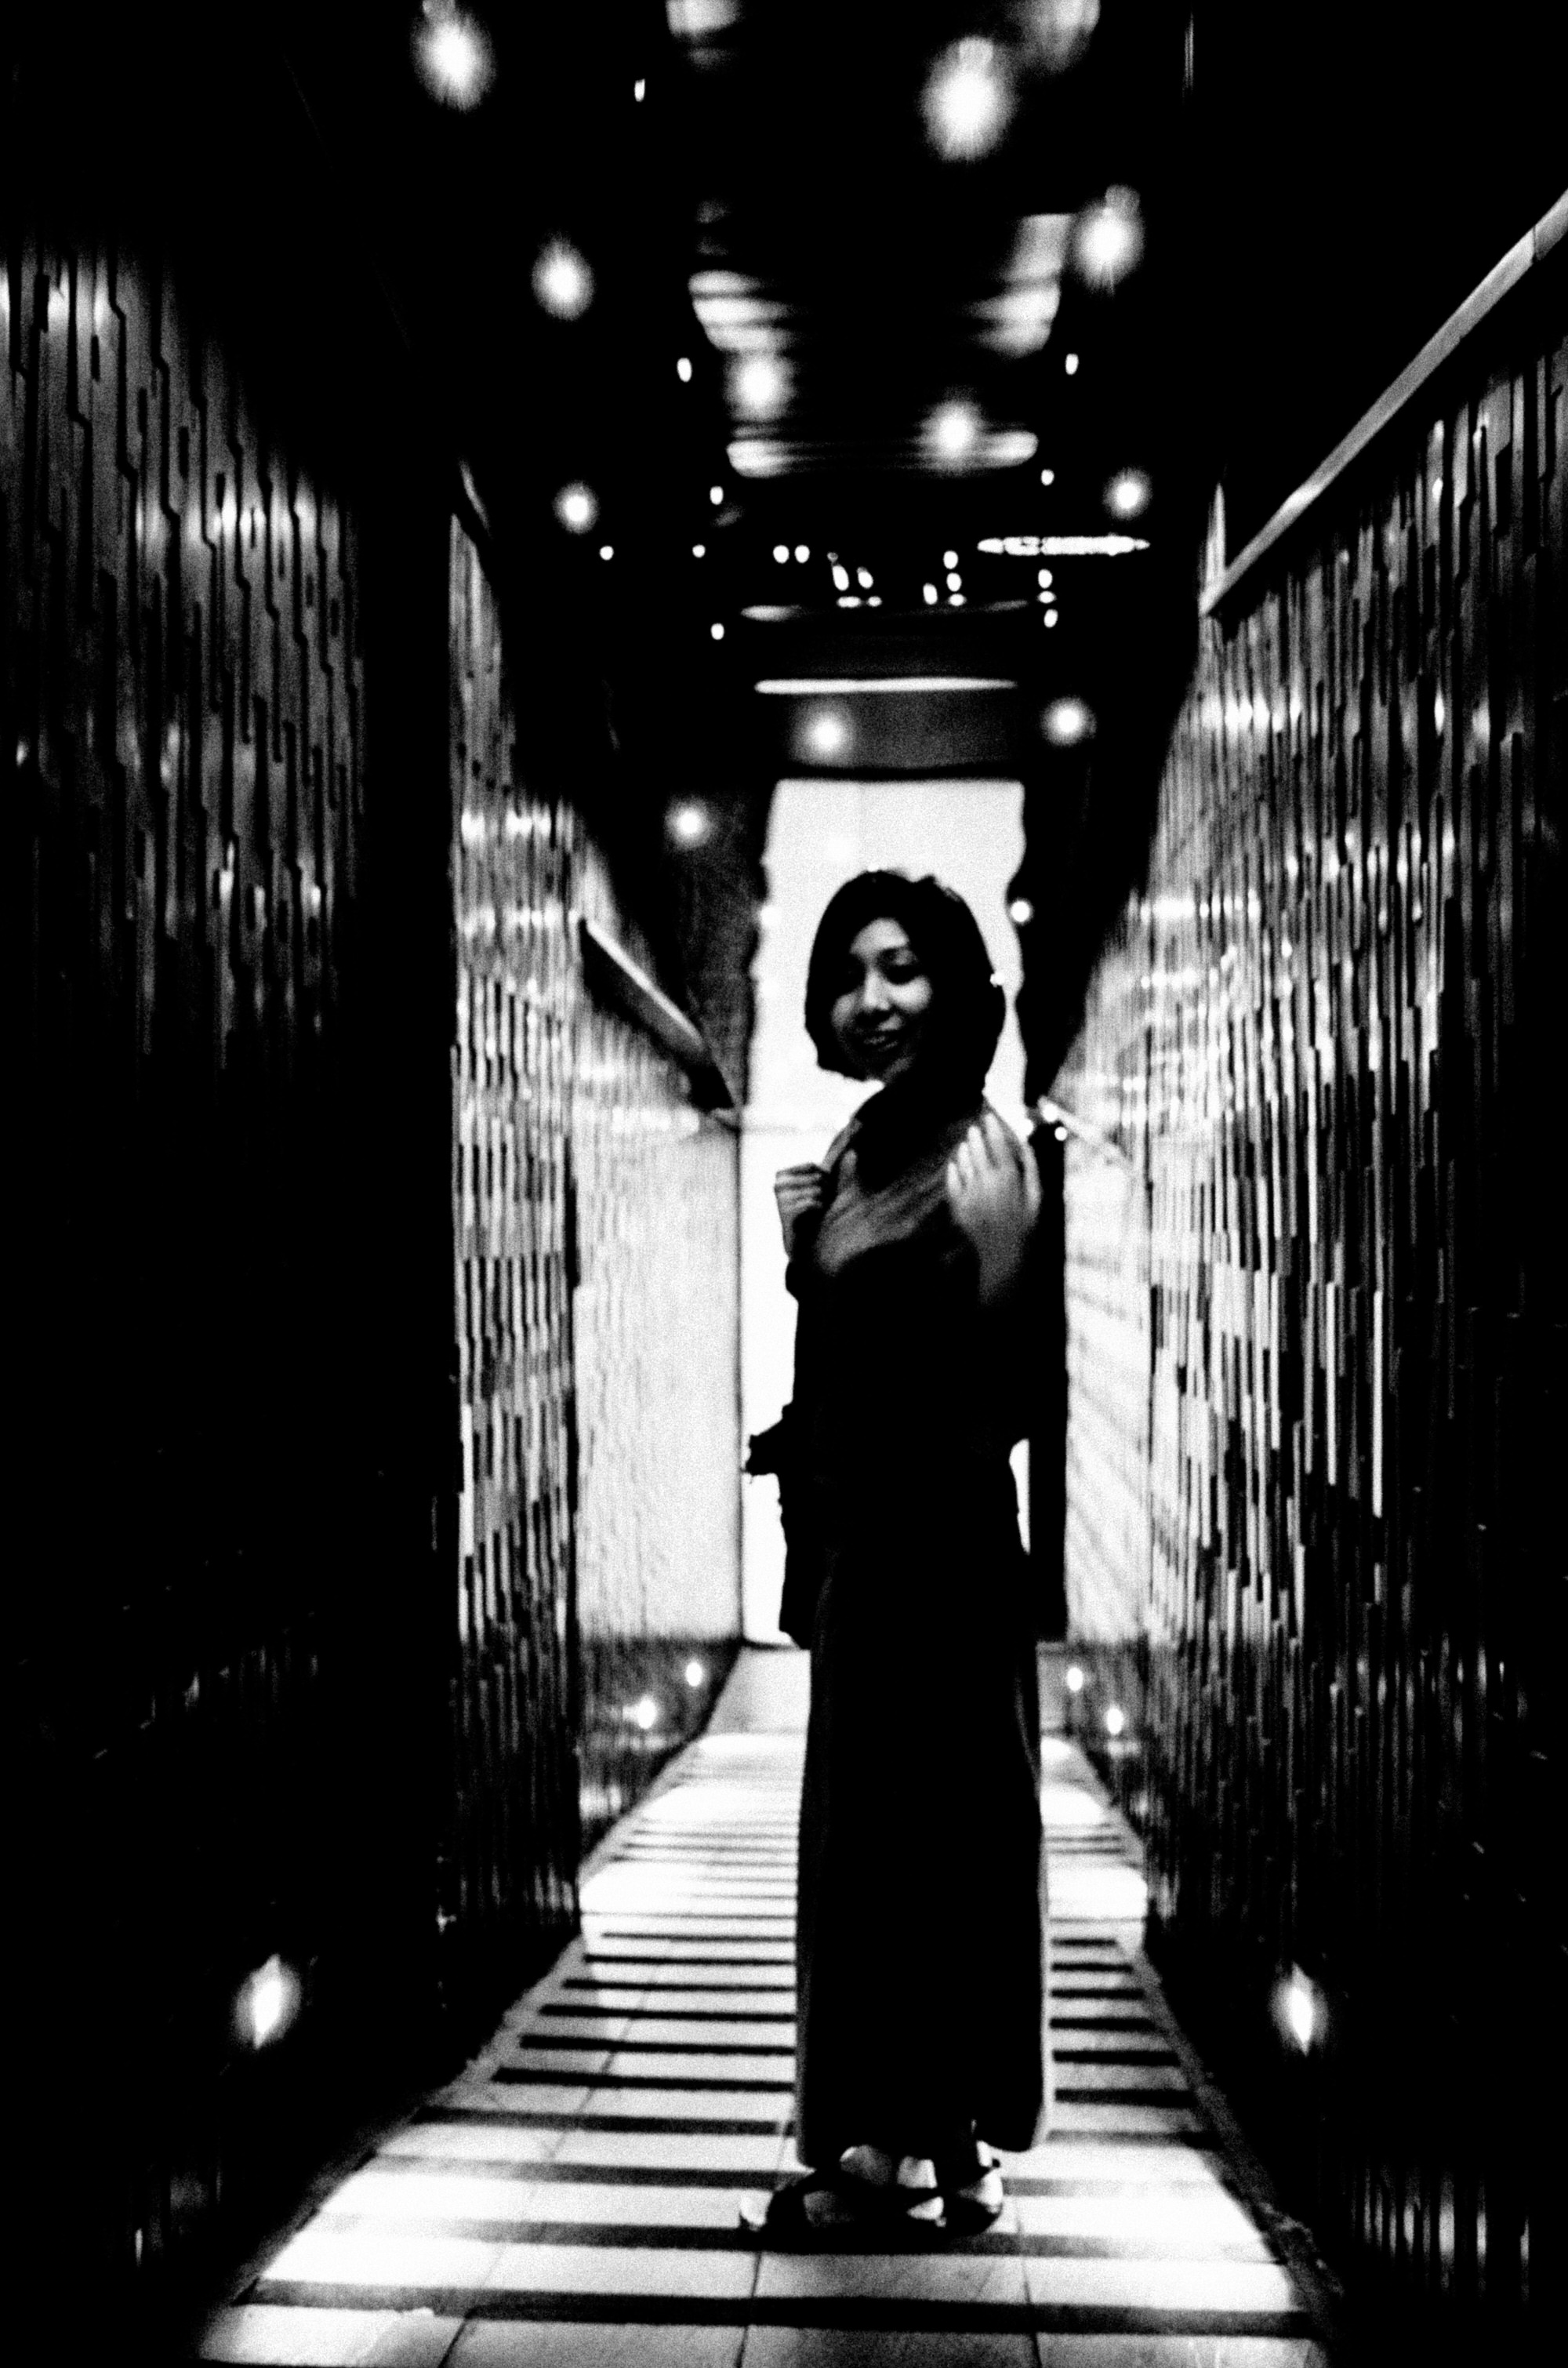 eric kim photography black and white - 32118130794_c057b35346_o